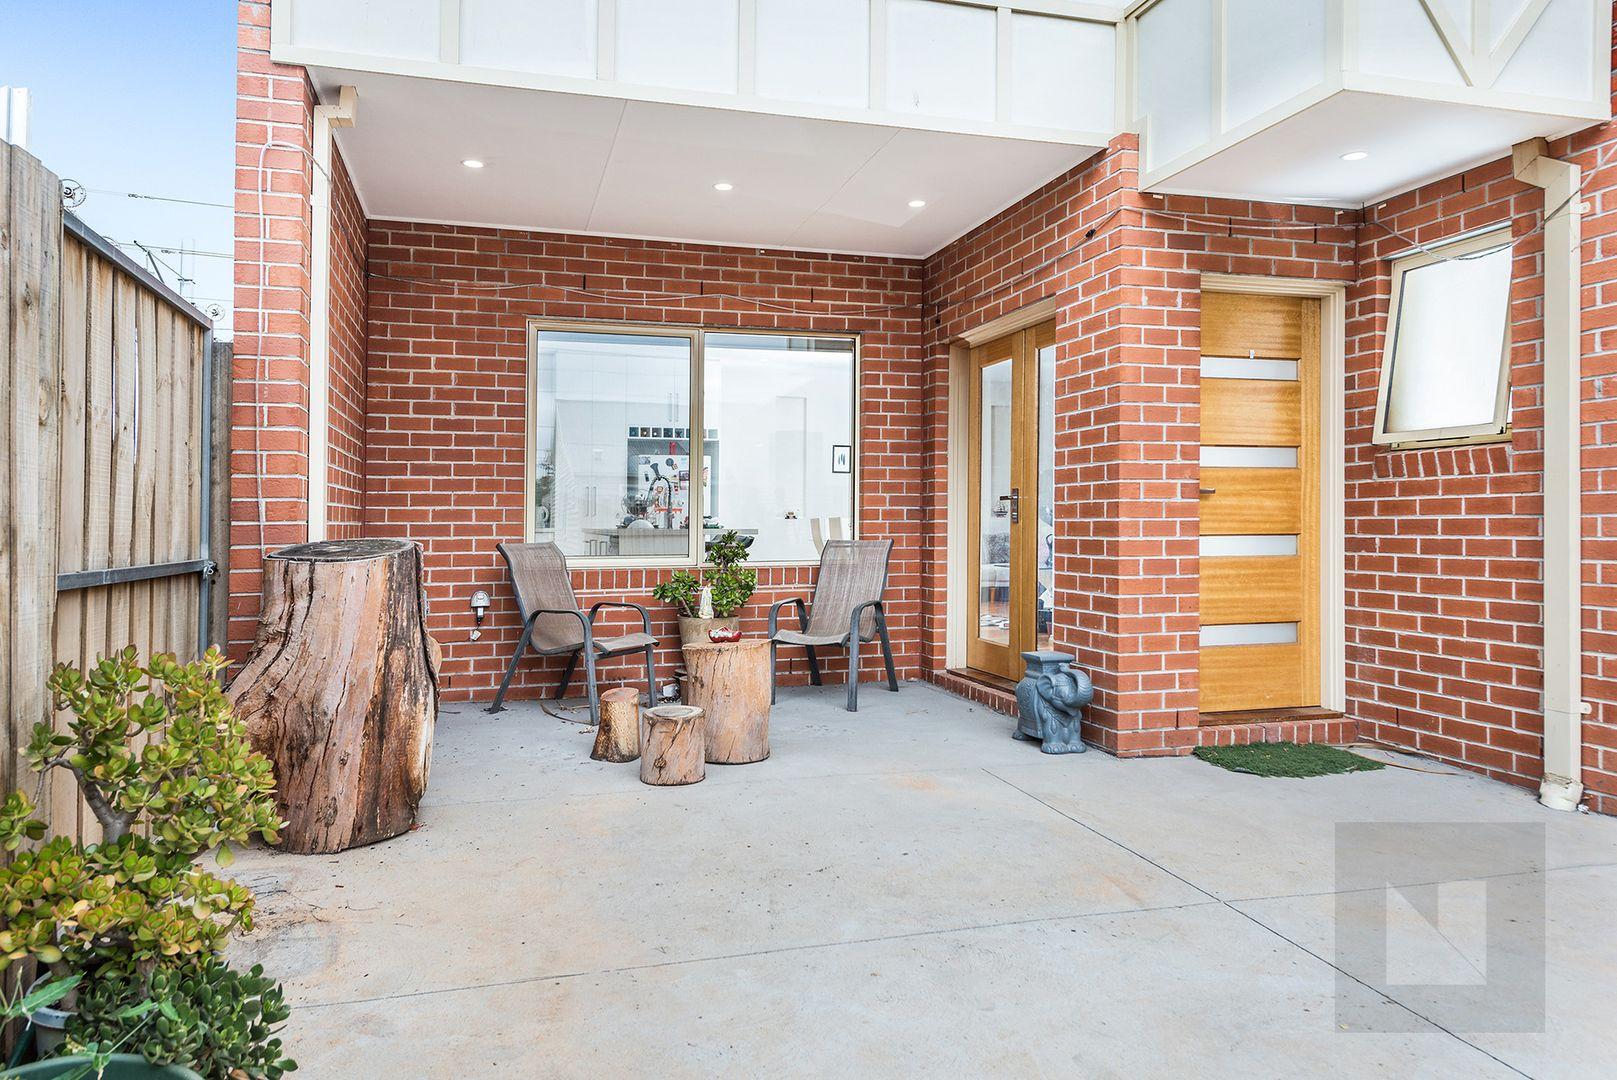 2/19 Errol Street, Footscray VIC 3011, Image 1